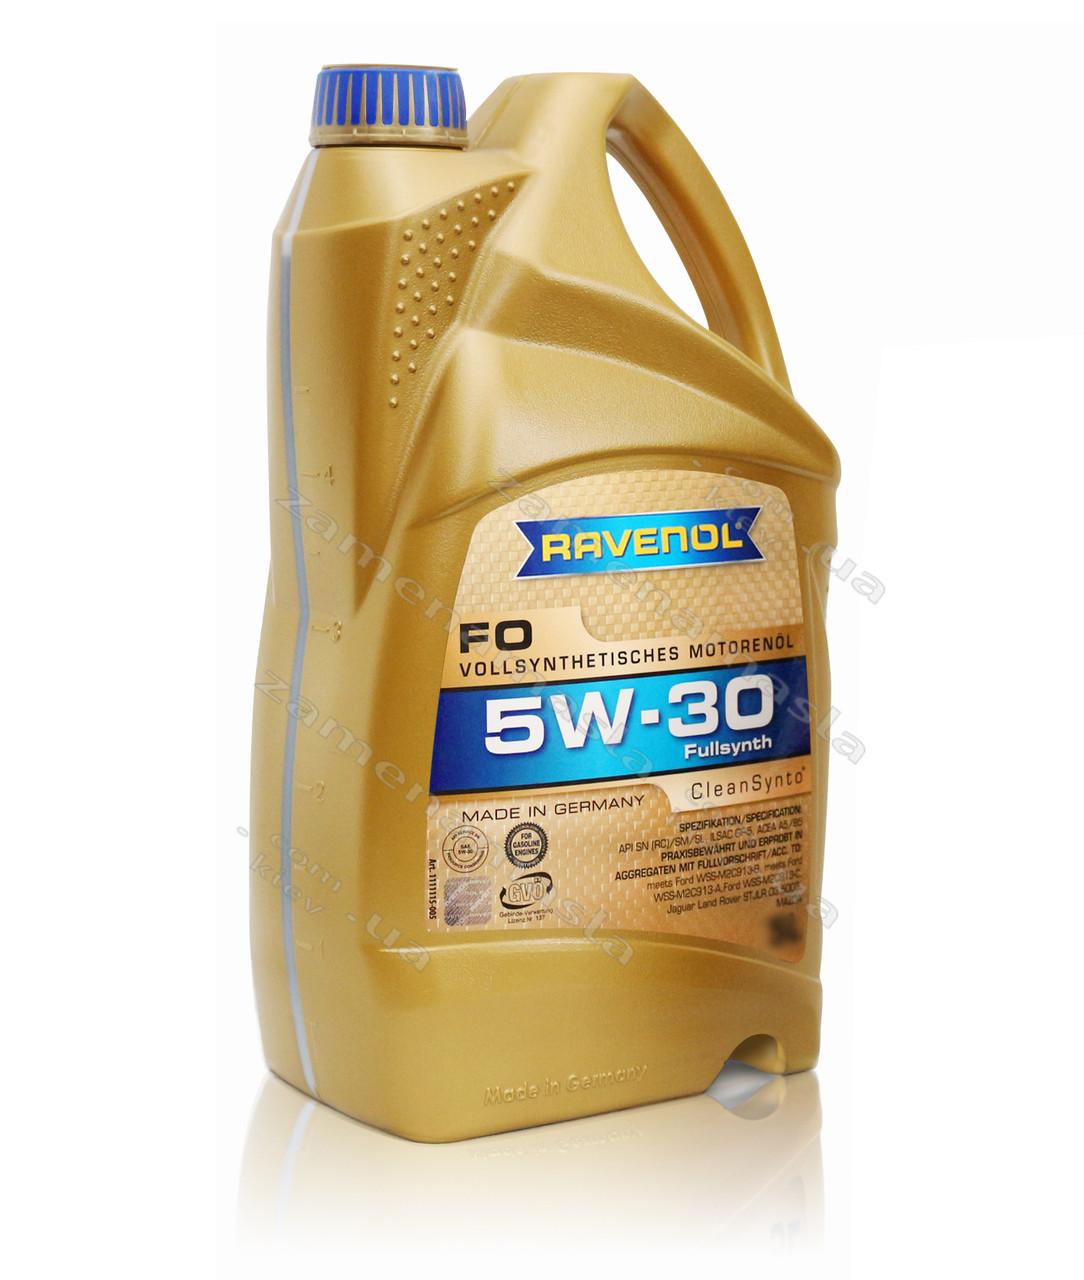 Ravenol FO 5W-30 4л - моторное масло